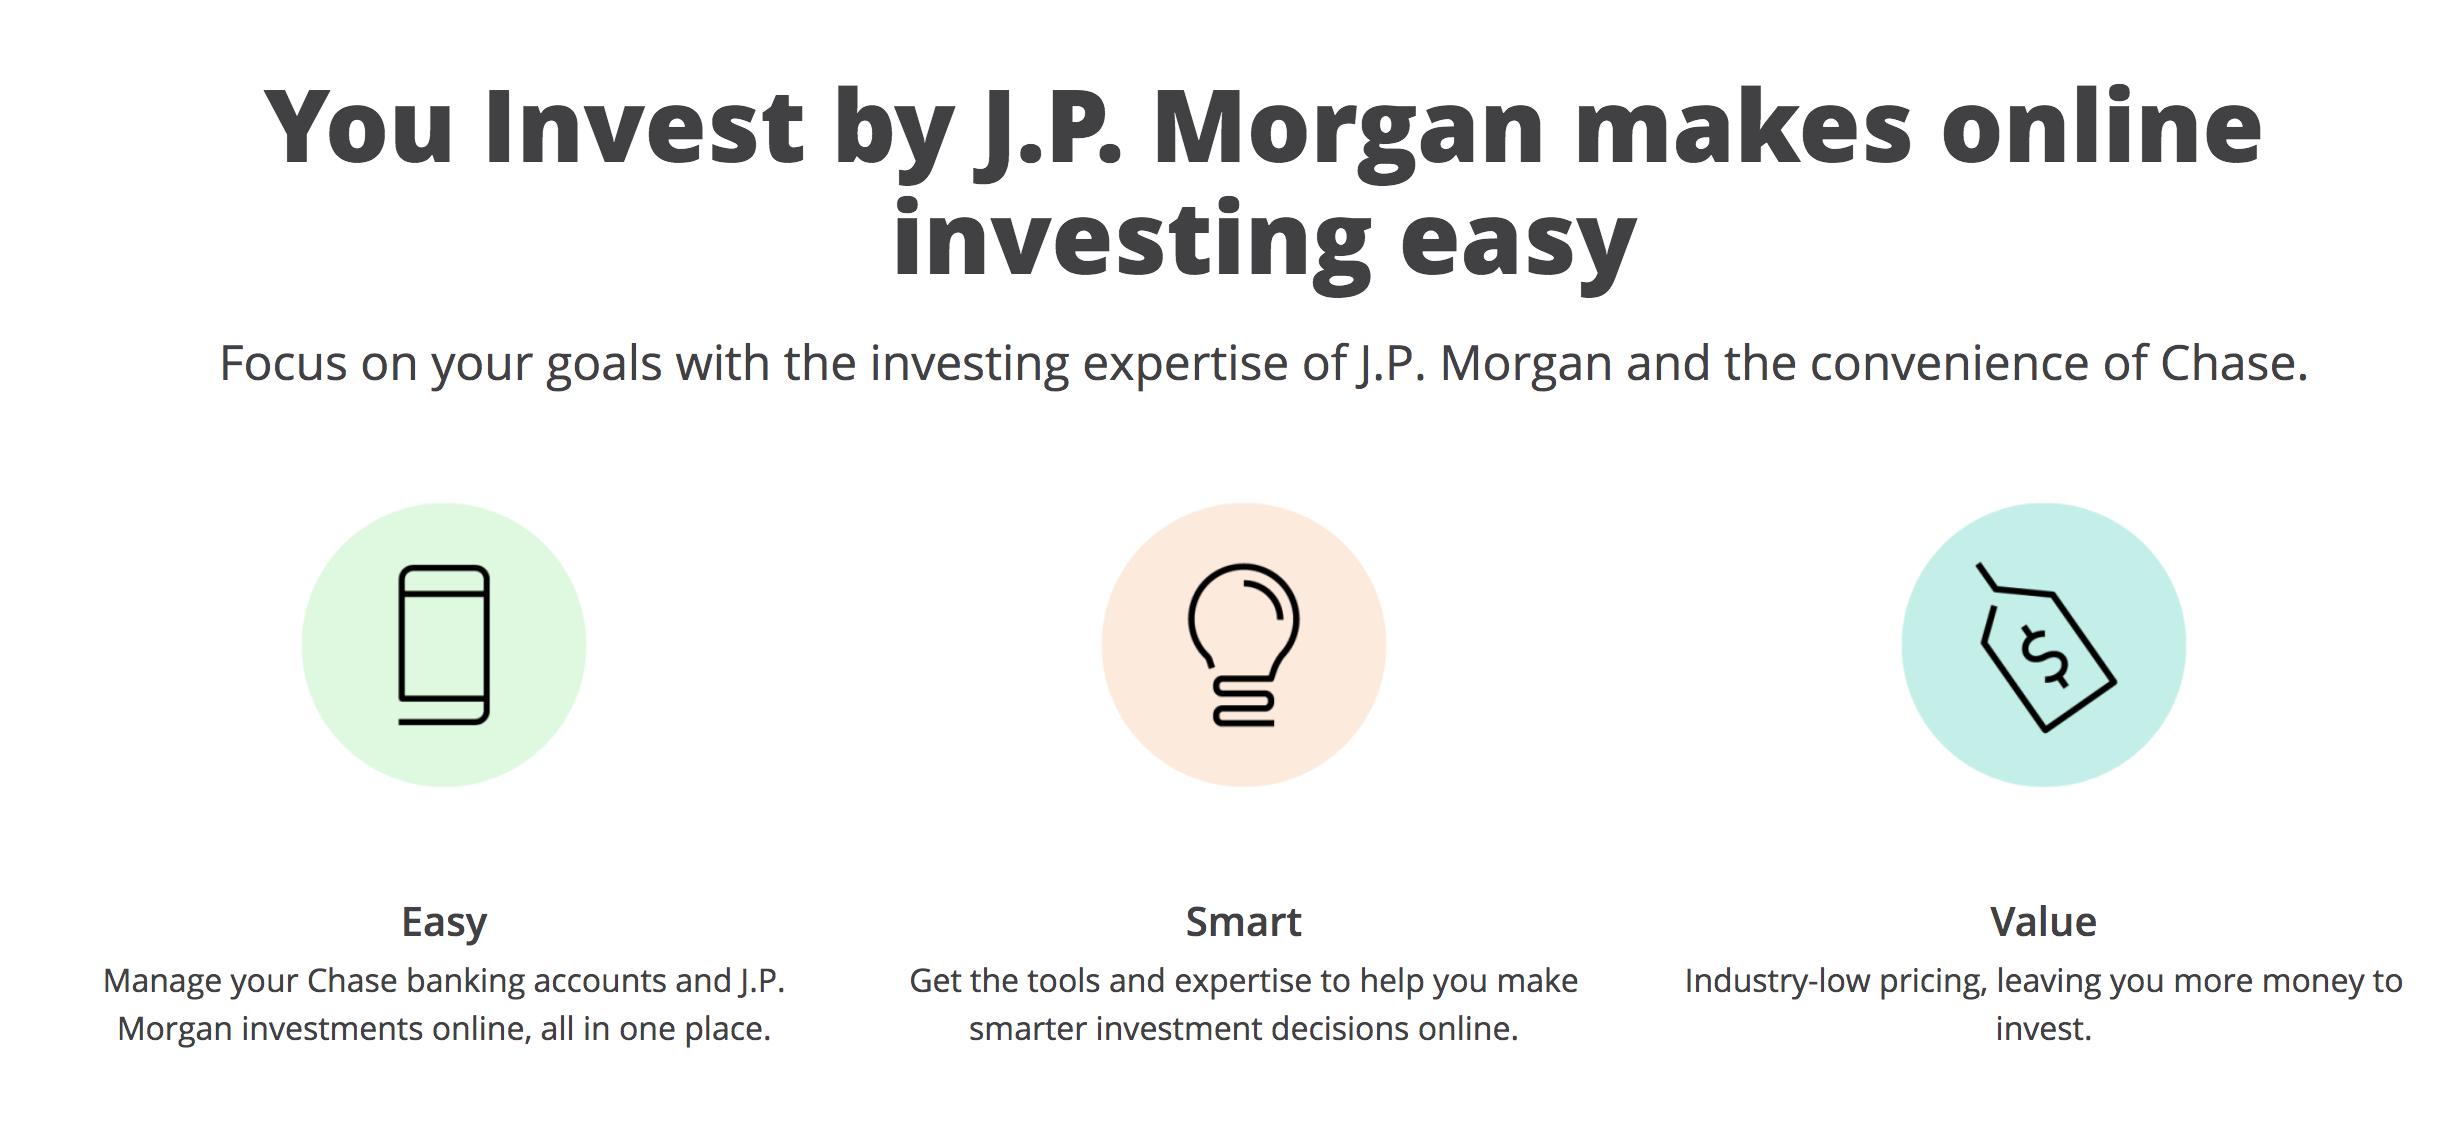 JP Morgan Introduces Low-Cost Robo-Adviser